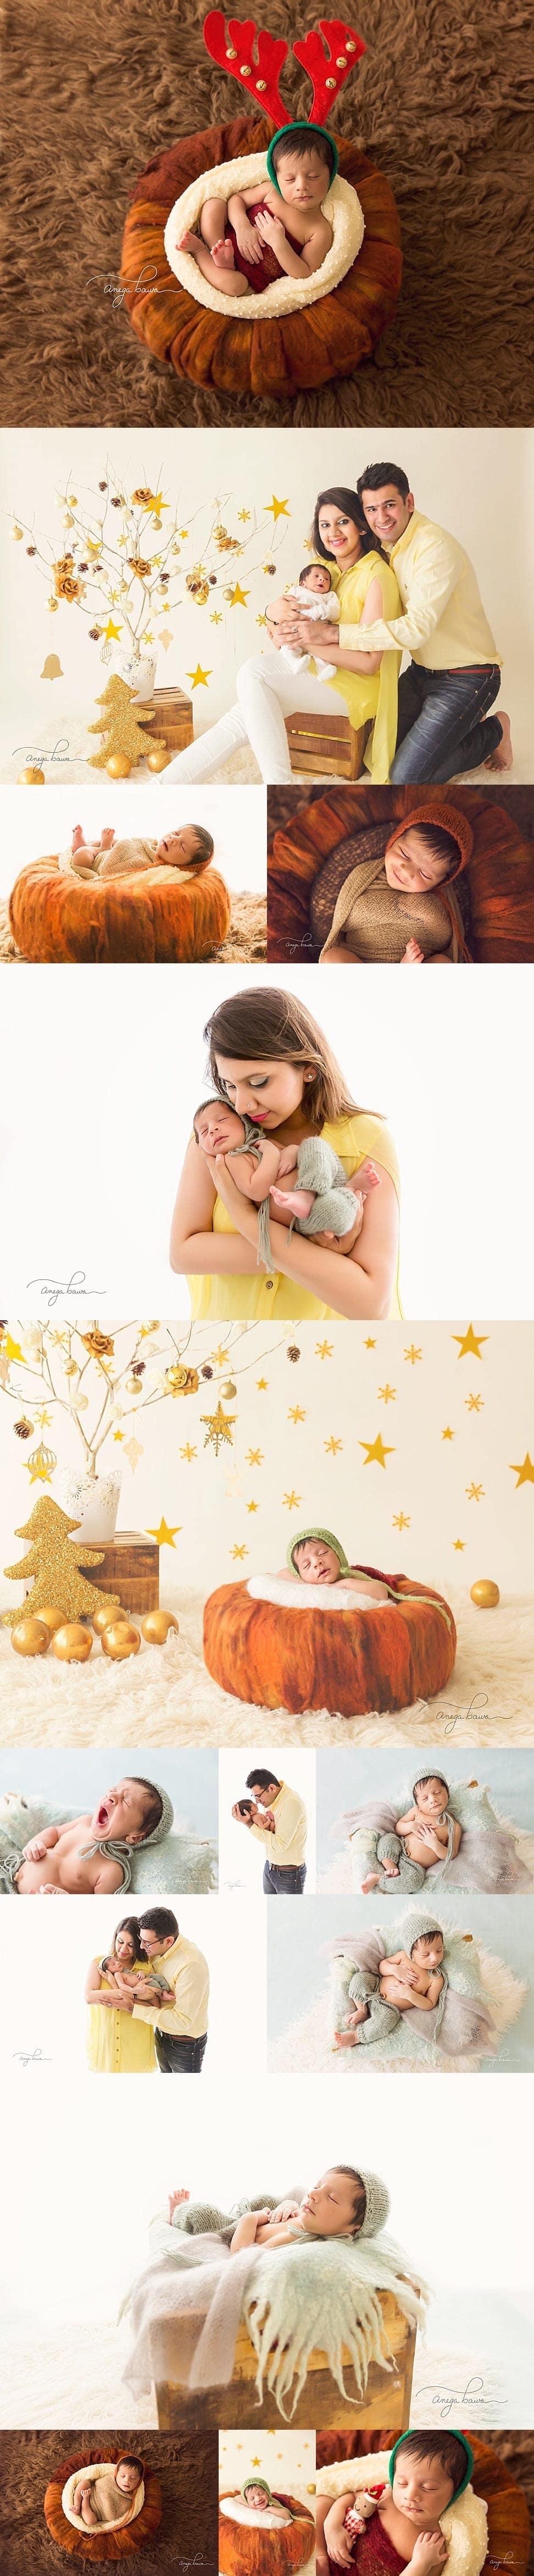 infant photoshoot in delhi - newborn photography